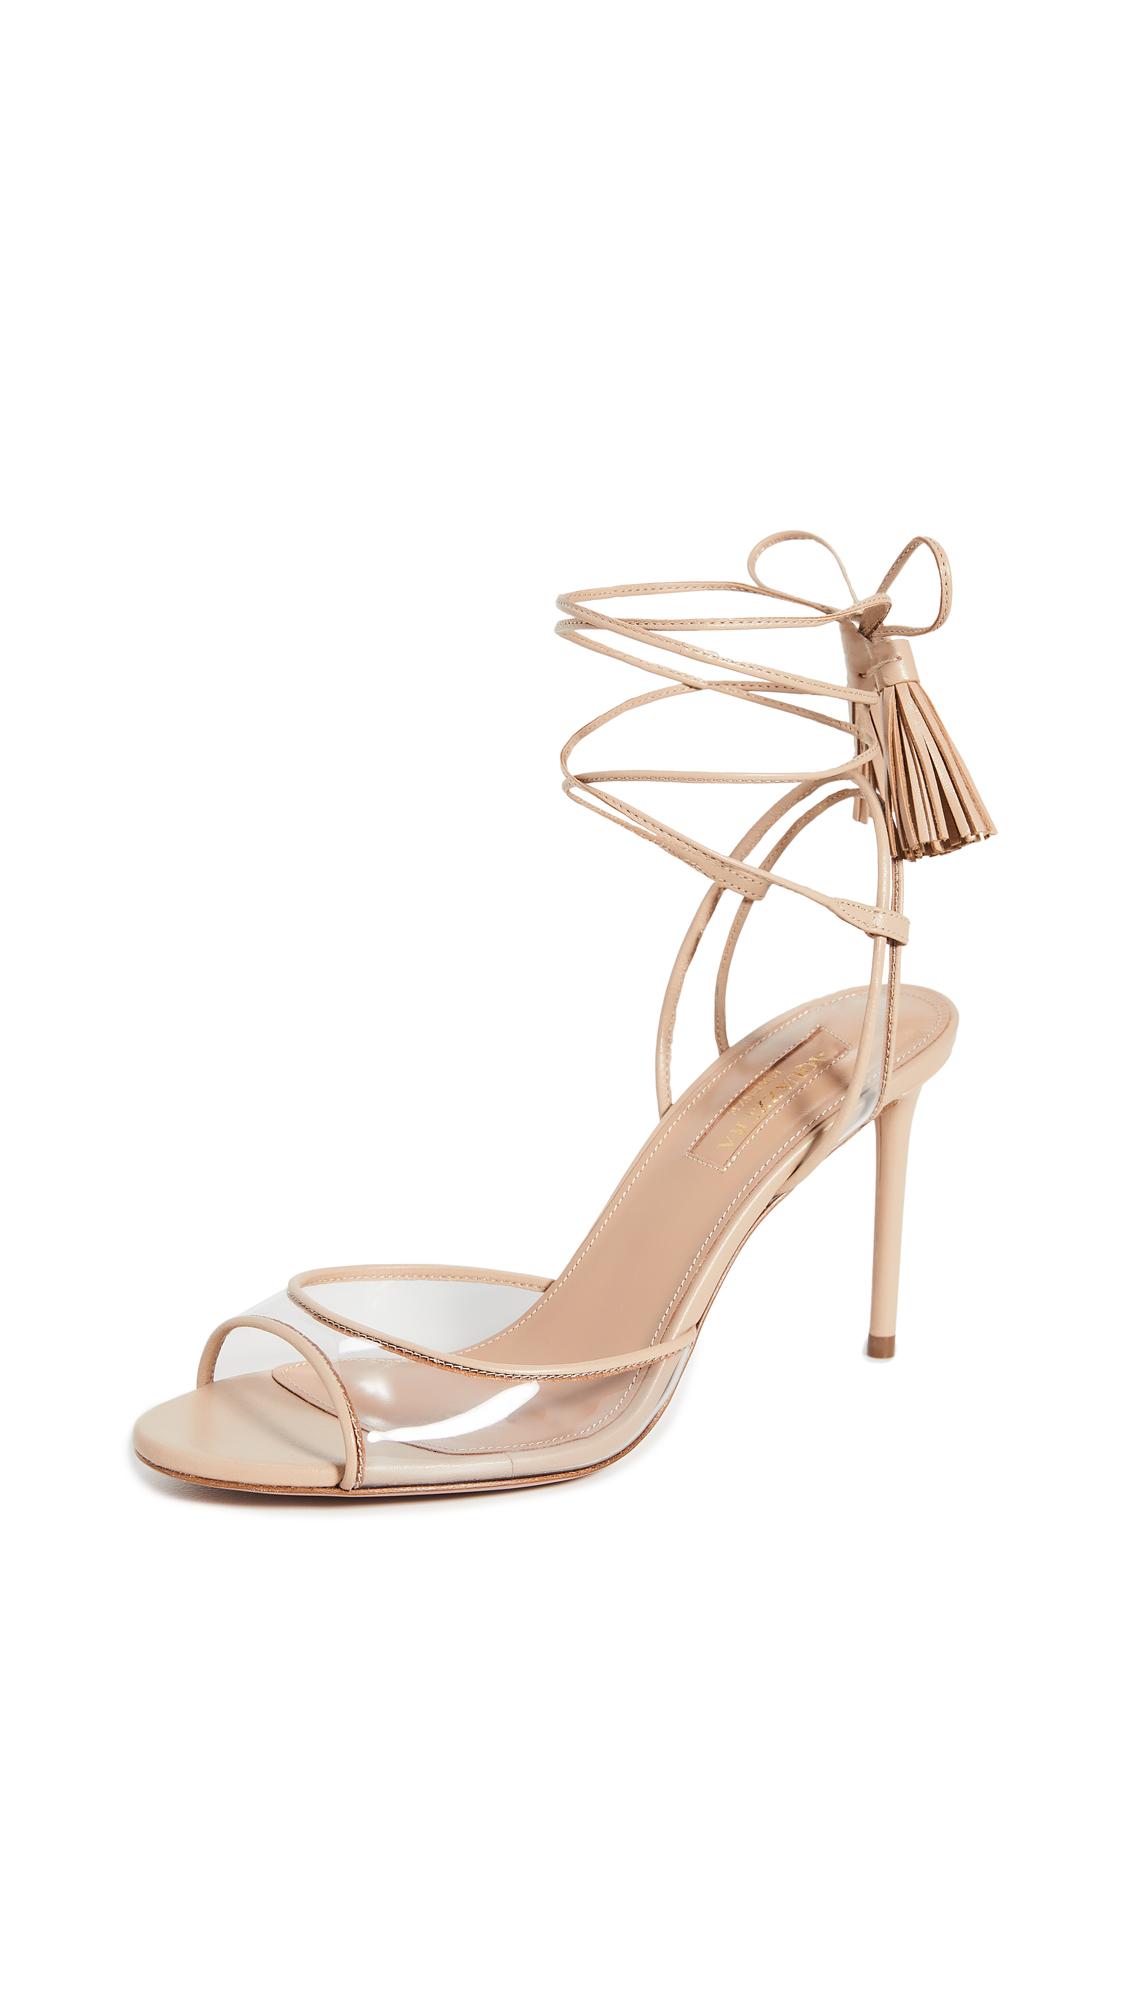 Aquazzura Nudist 85mm Sandals - 50% Off Sale